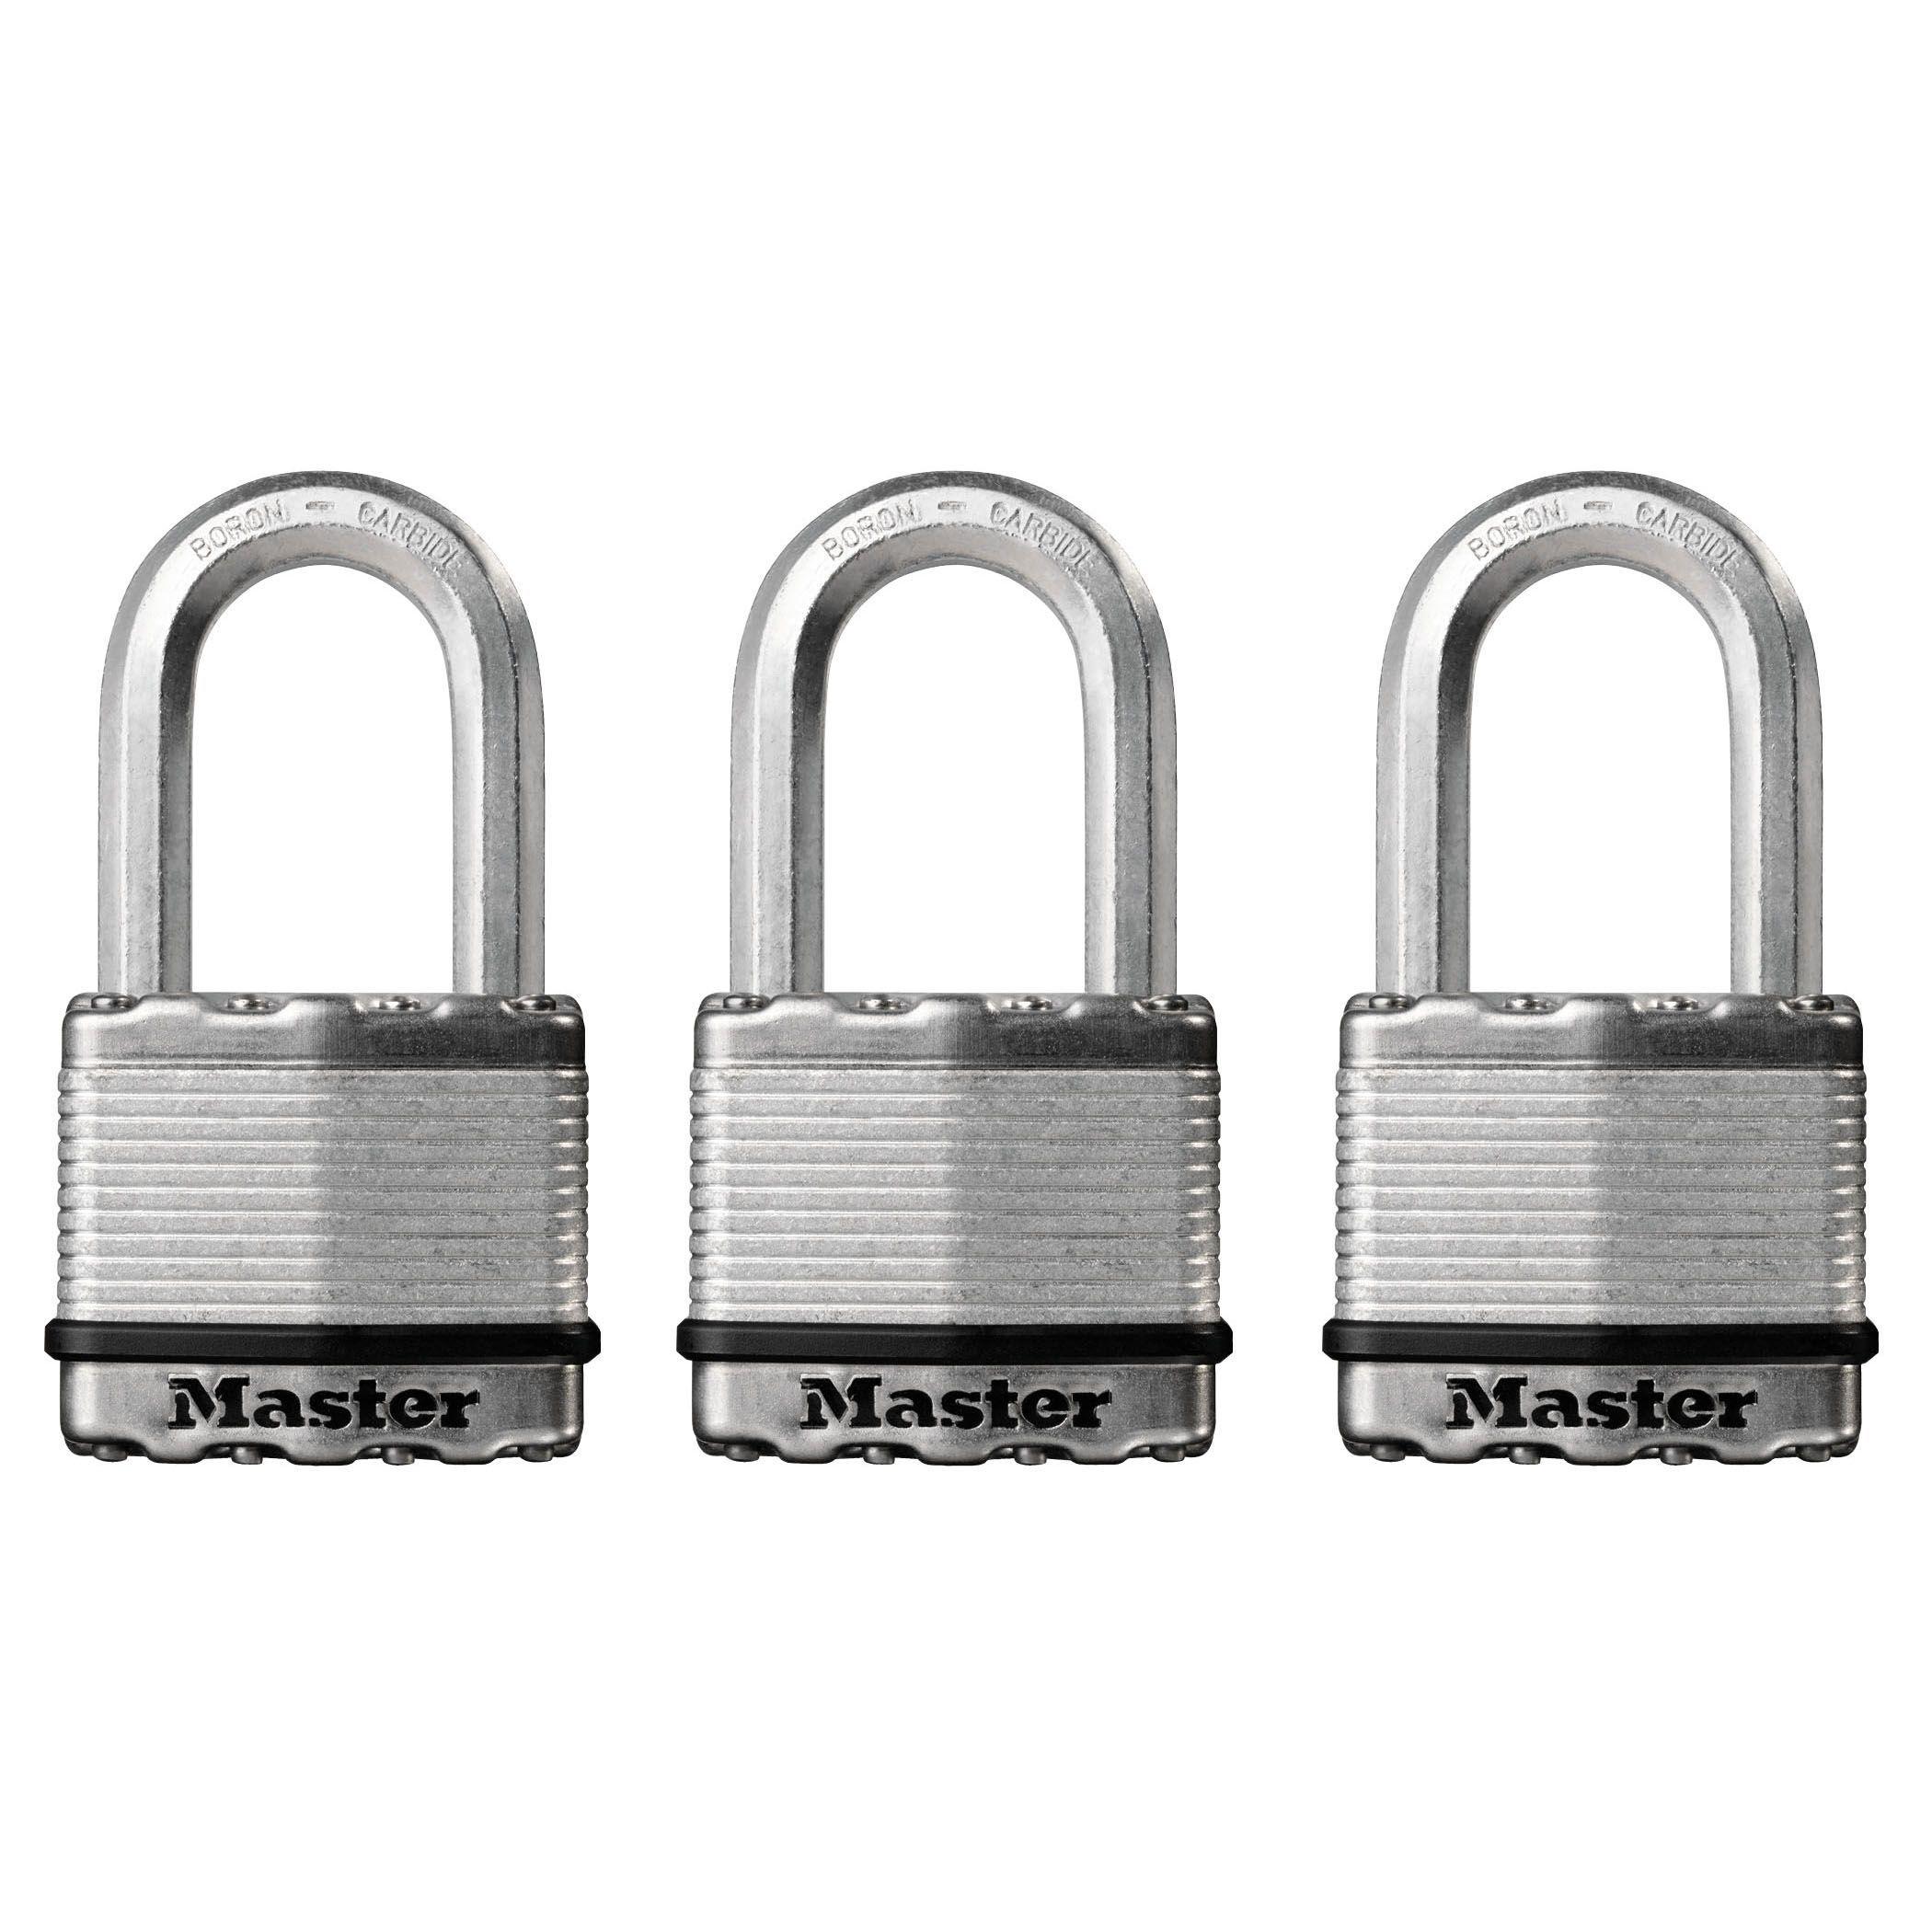 Master Lock Steel Pin Tumbler Octagonal Open Shackle Padlock (w)50mm, Pack Of 3